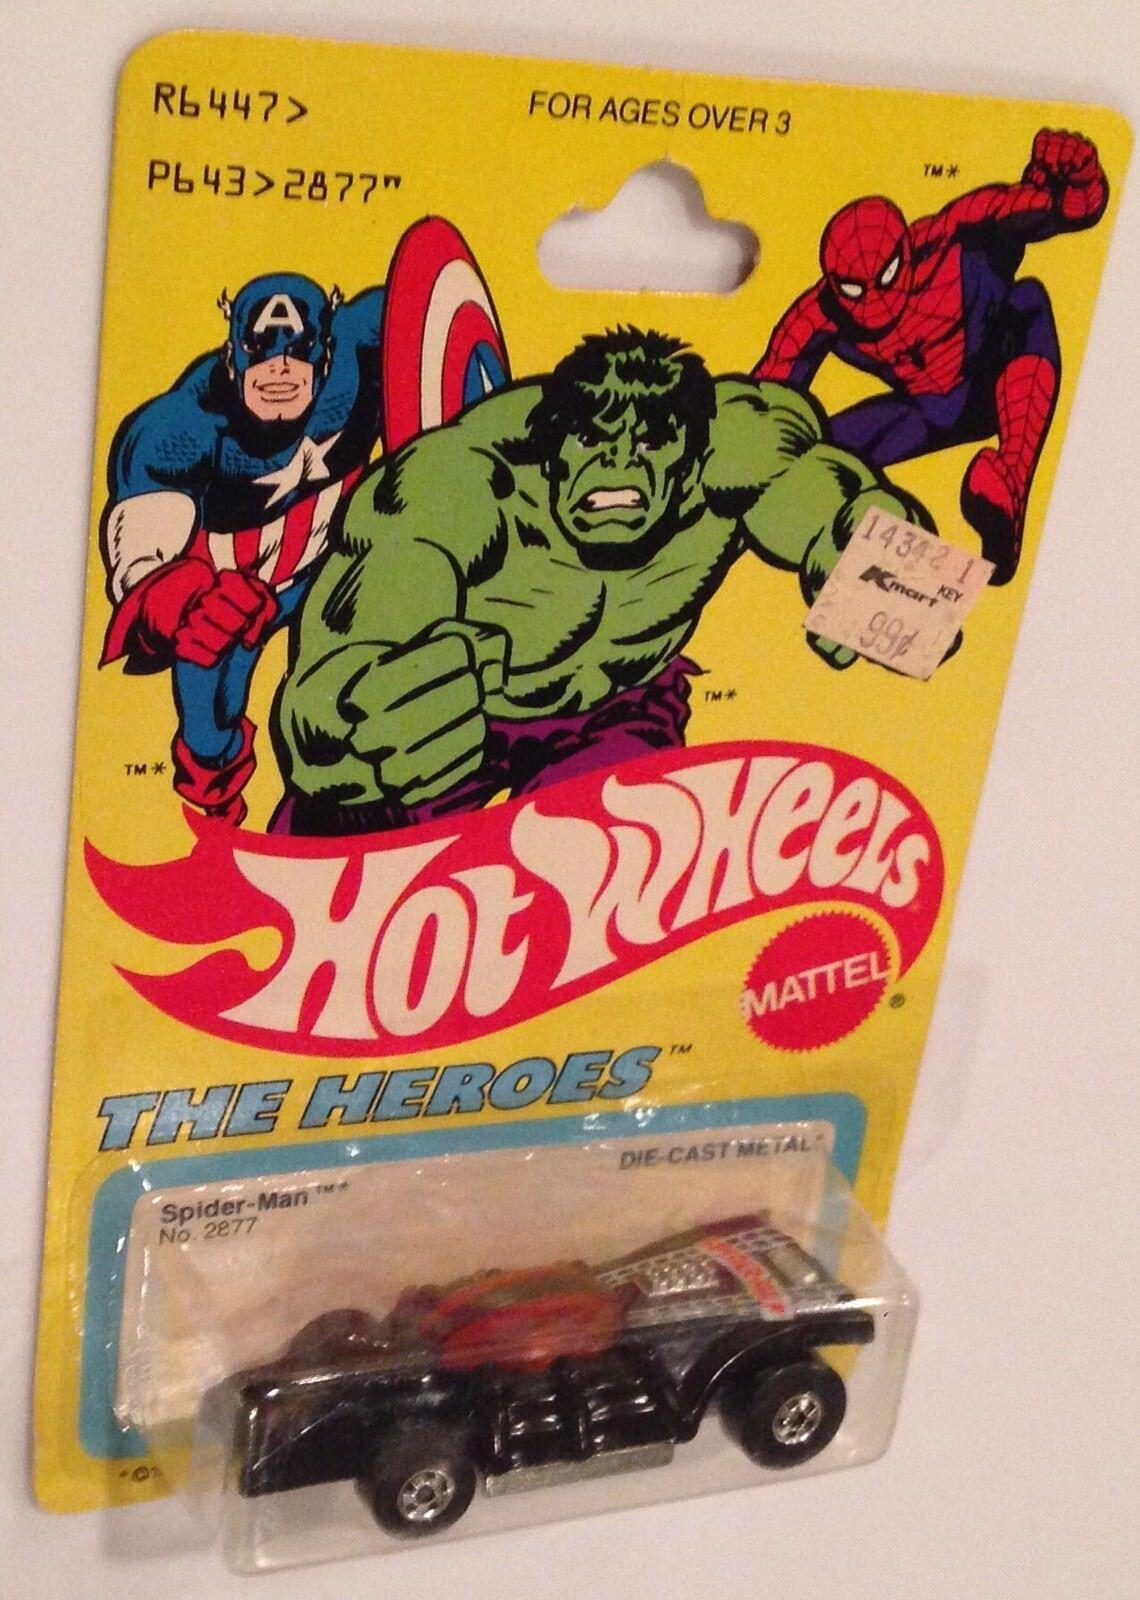 MONMC 1979 Hot Wheels The Heroes   schwarz Spider-Man Car with Basic Wheels